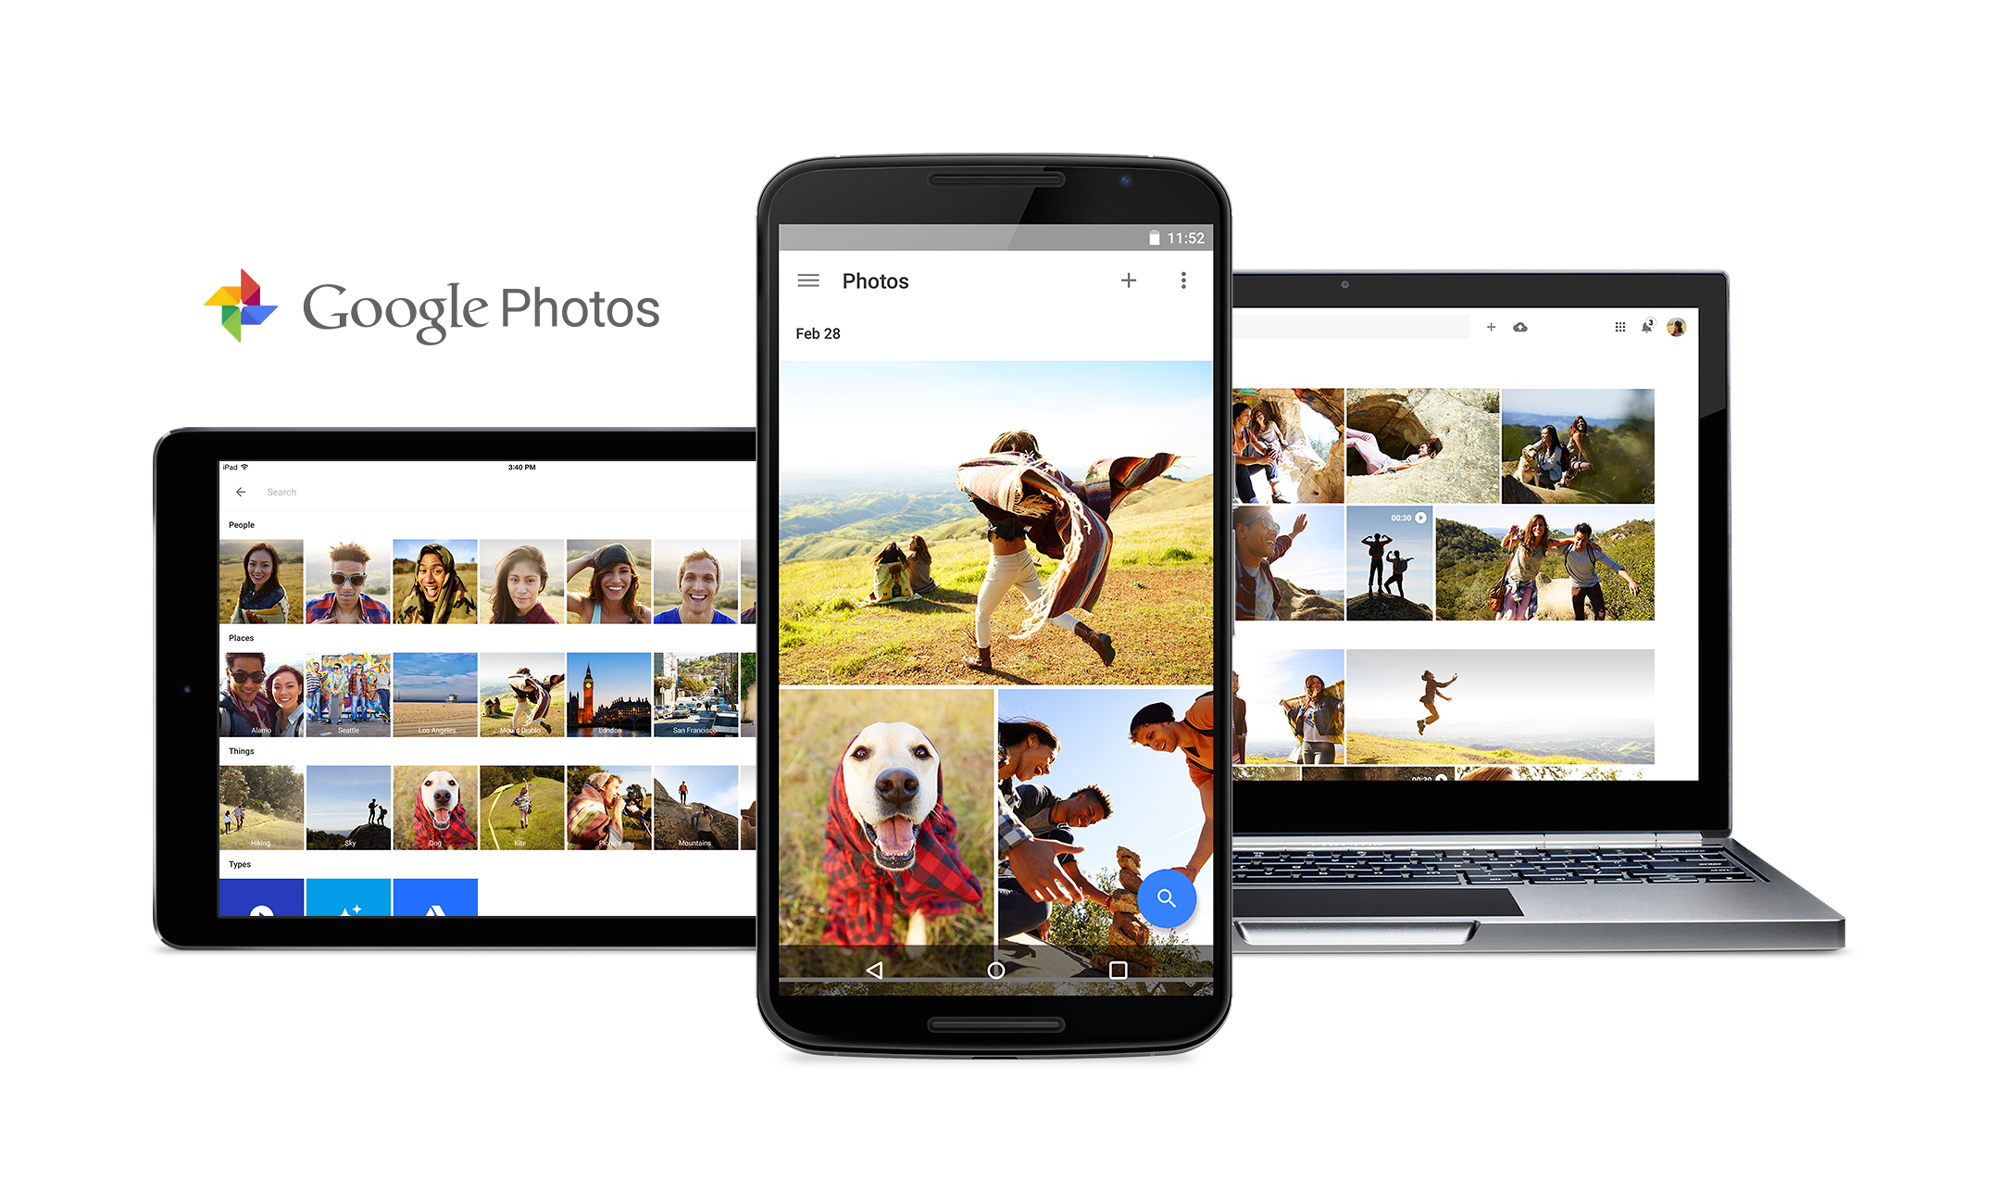 googlephotos_01